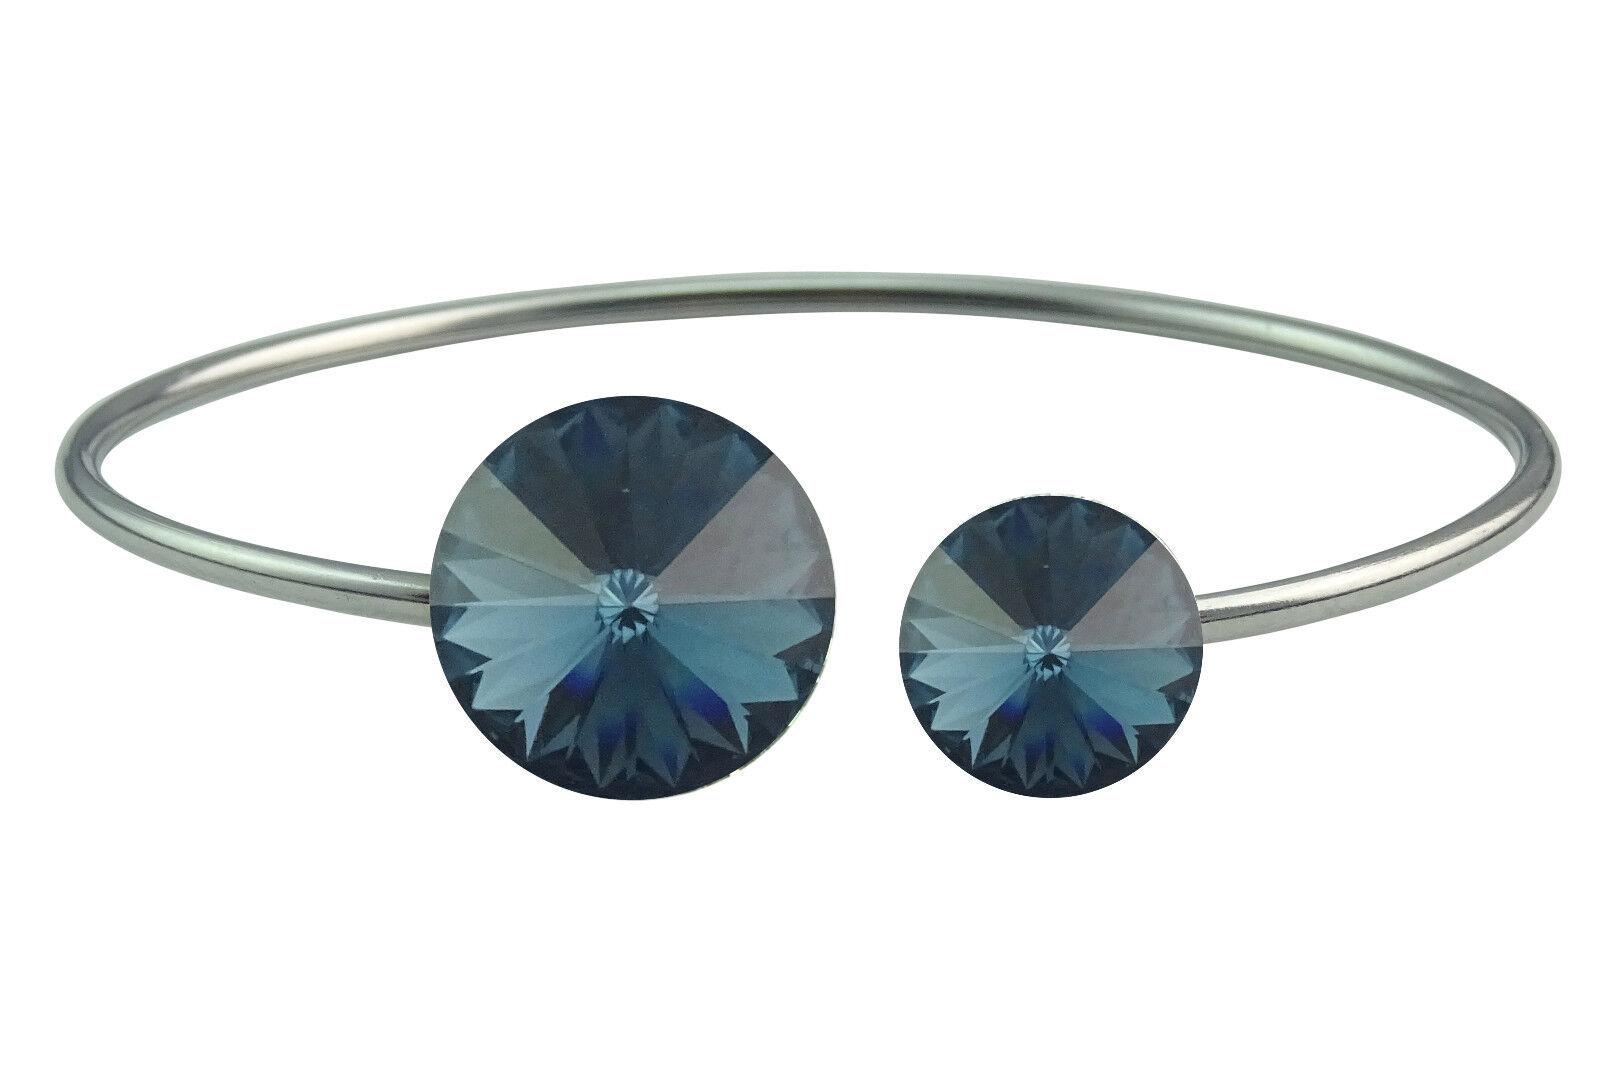 Armreif,Armband aus Edelstahl mit 2 Swarovski® Kristallen,montana,dunkelblau